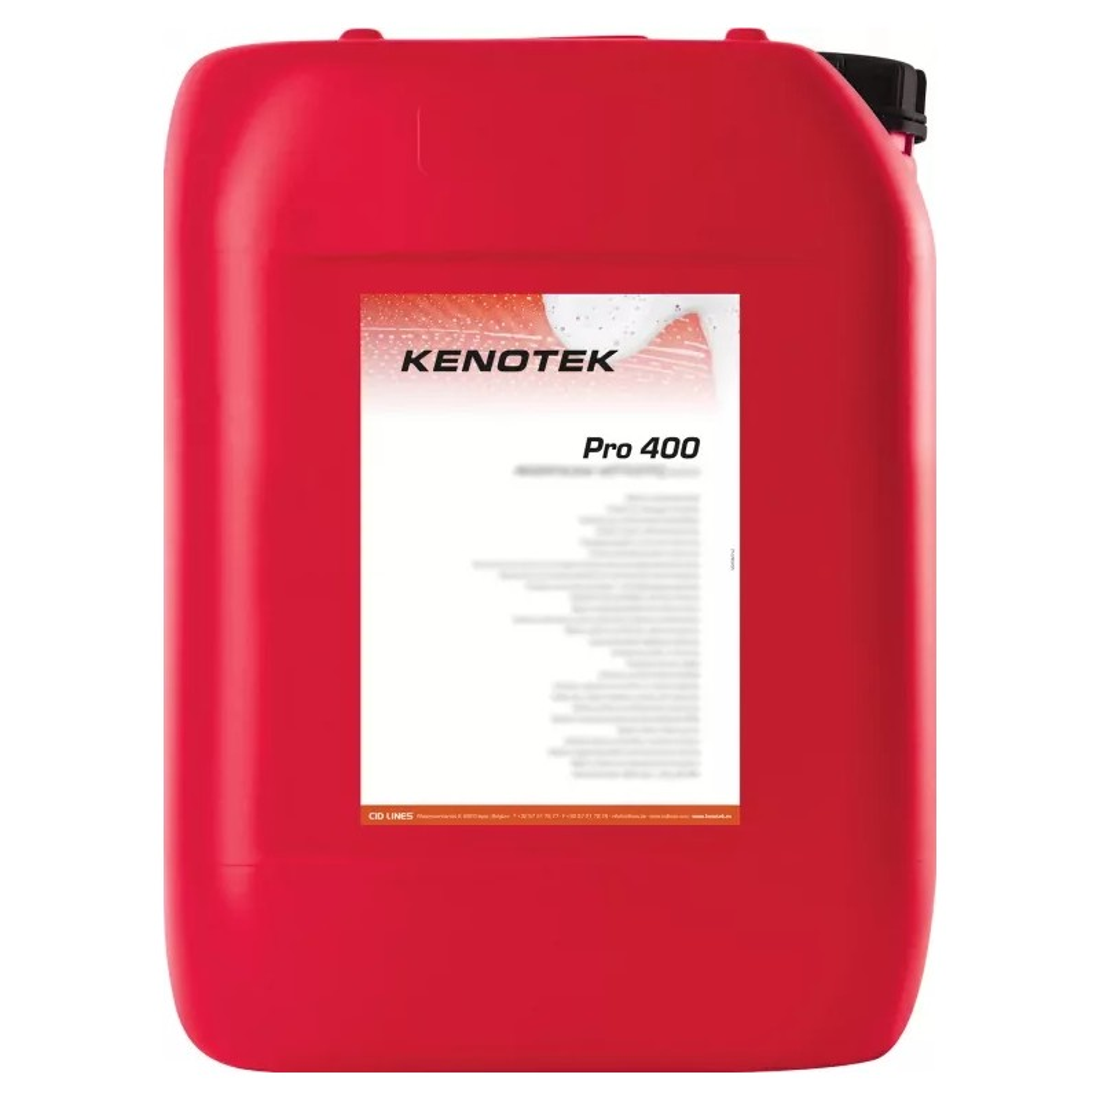 KENOTEK PRO 400 CLEANS AND RENOVATES METAL CONSTRUCTIONS